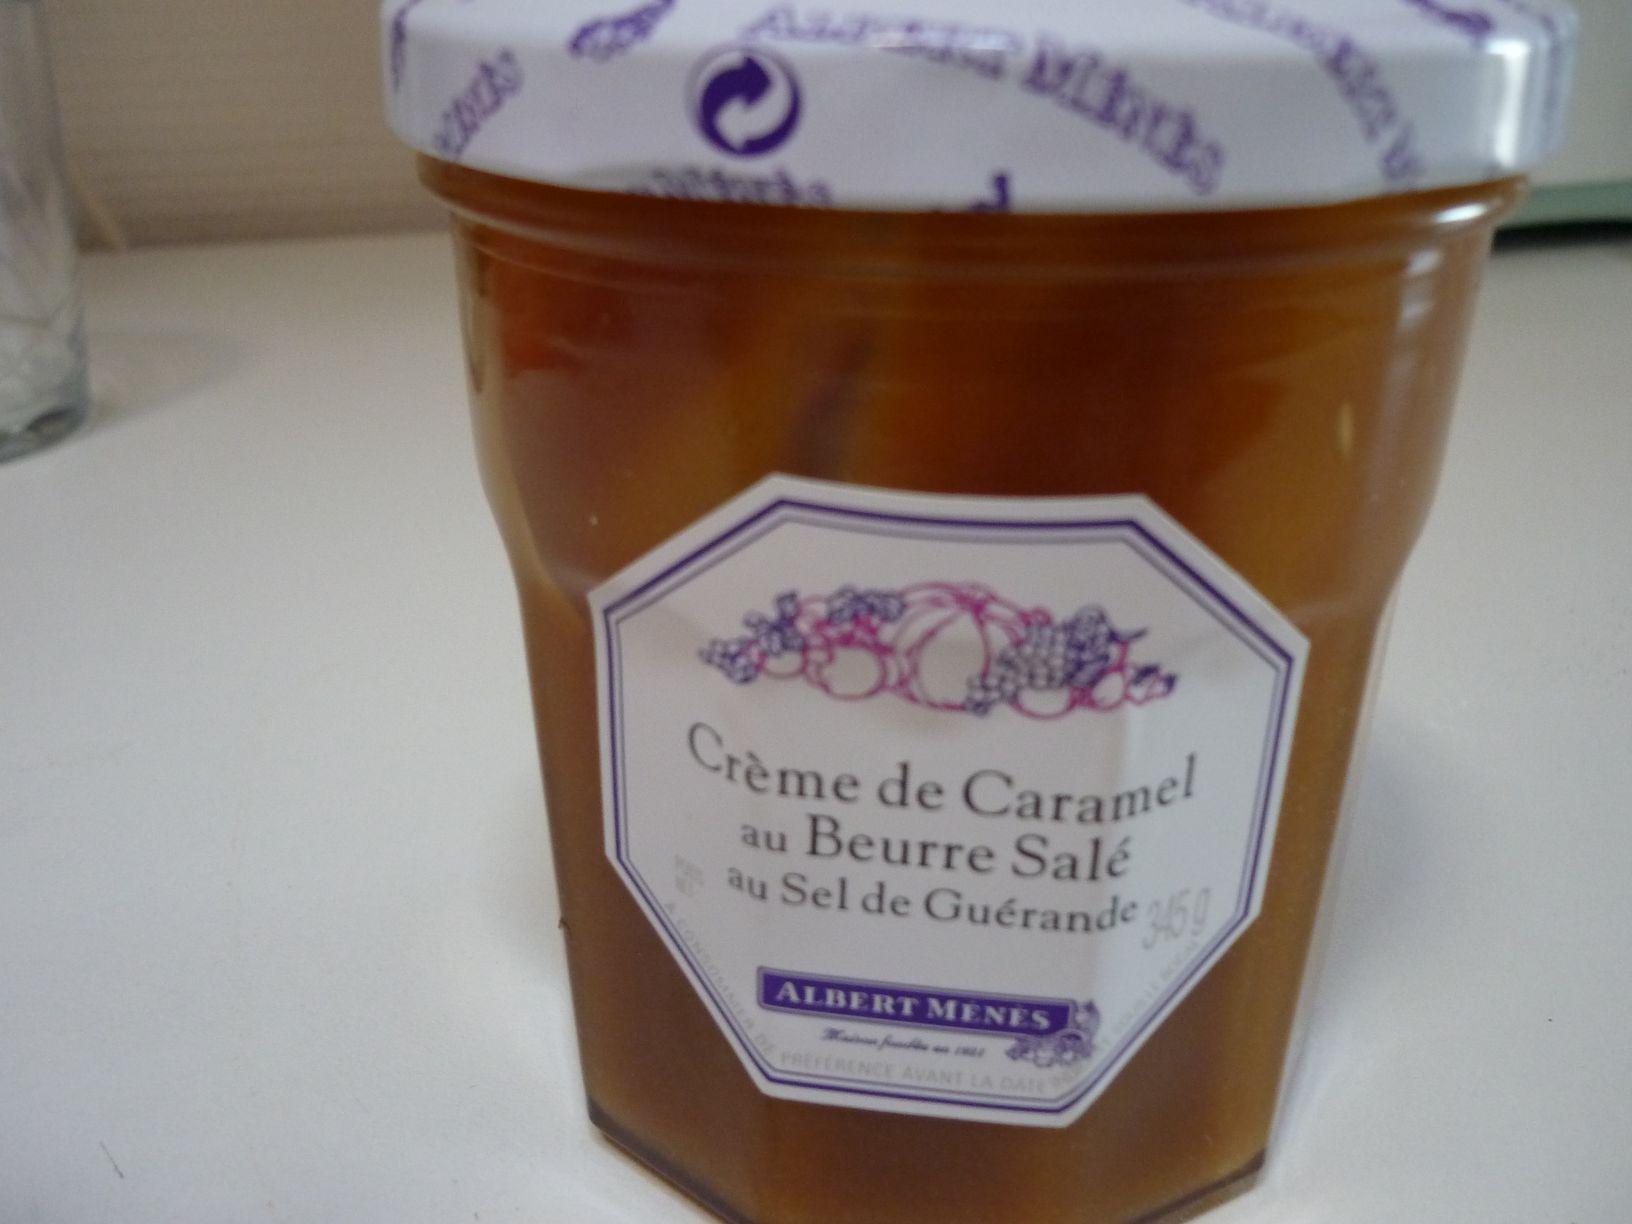 caramel beurre salé albert menes